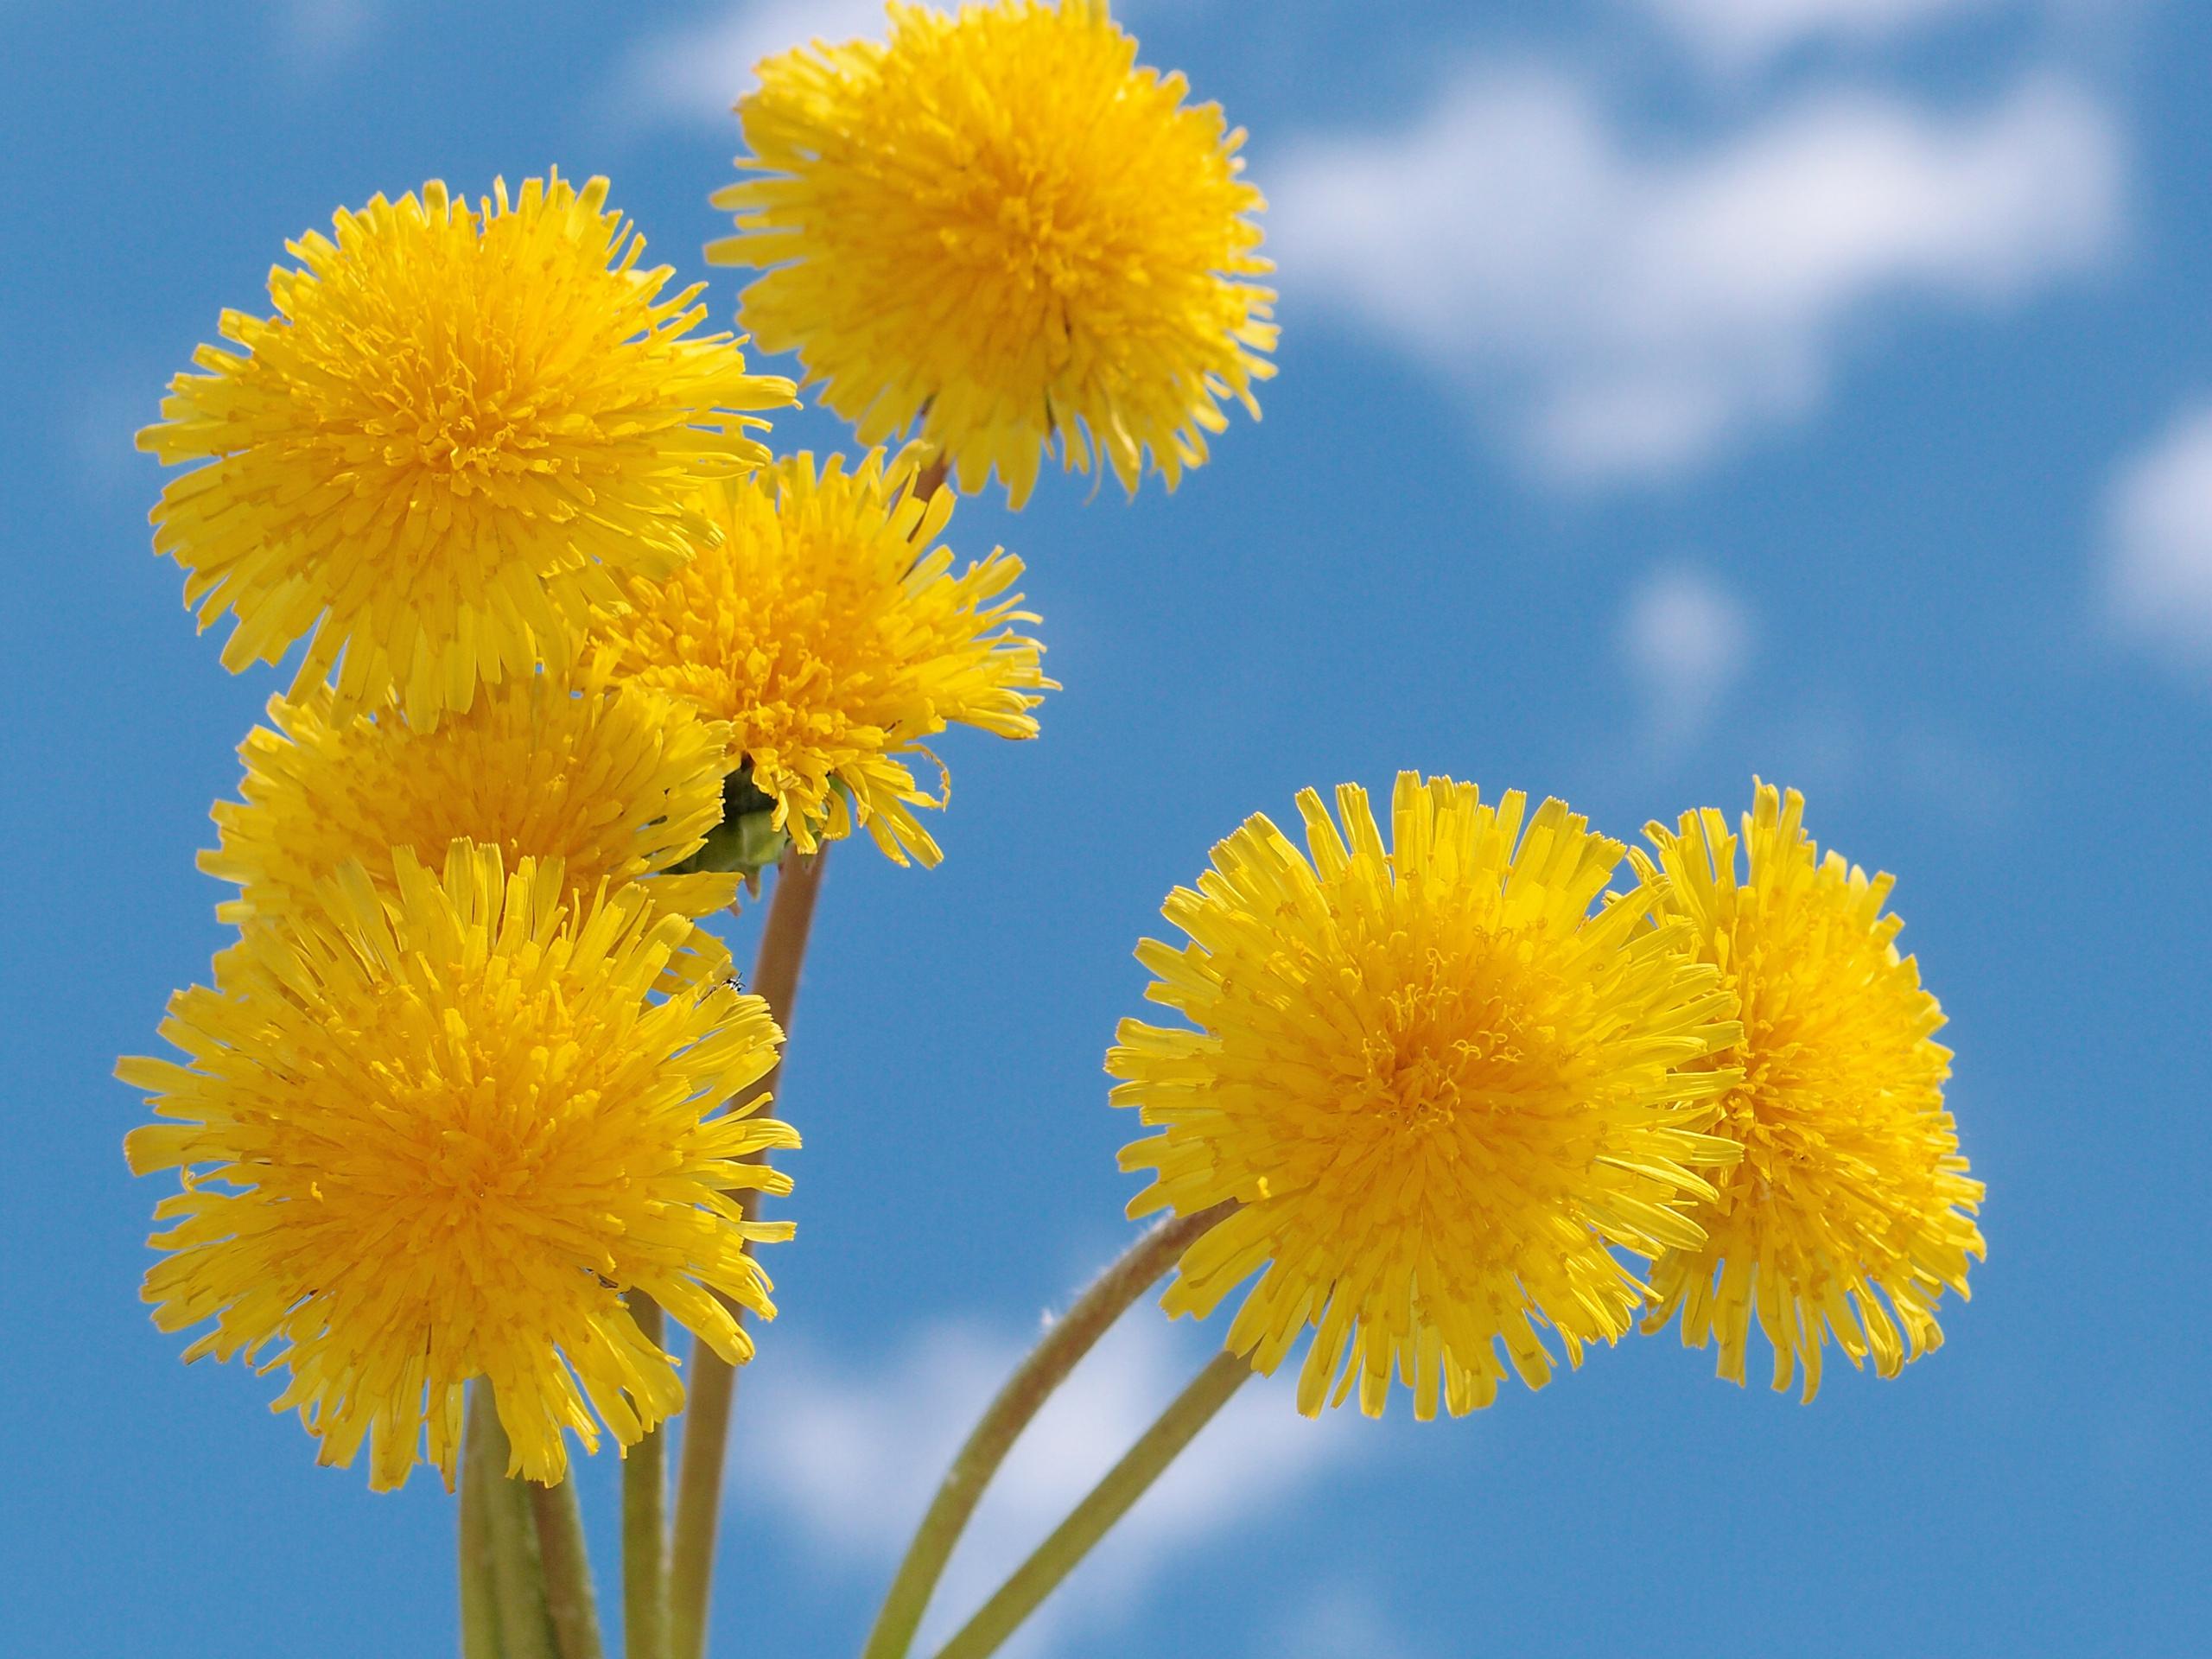 желтые цветы бесплатно